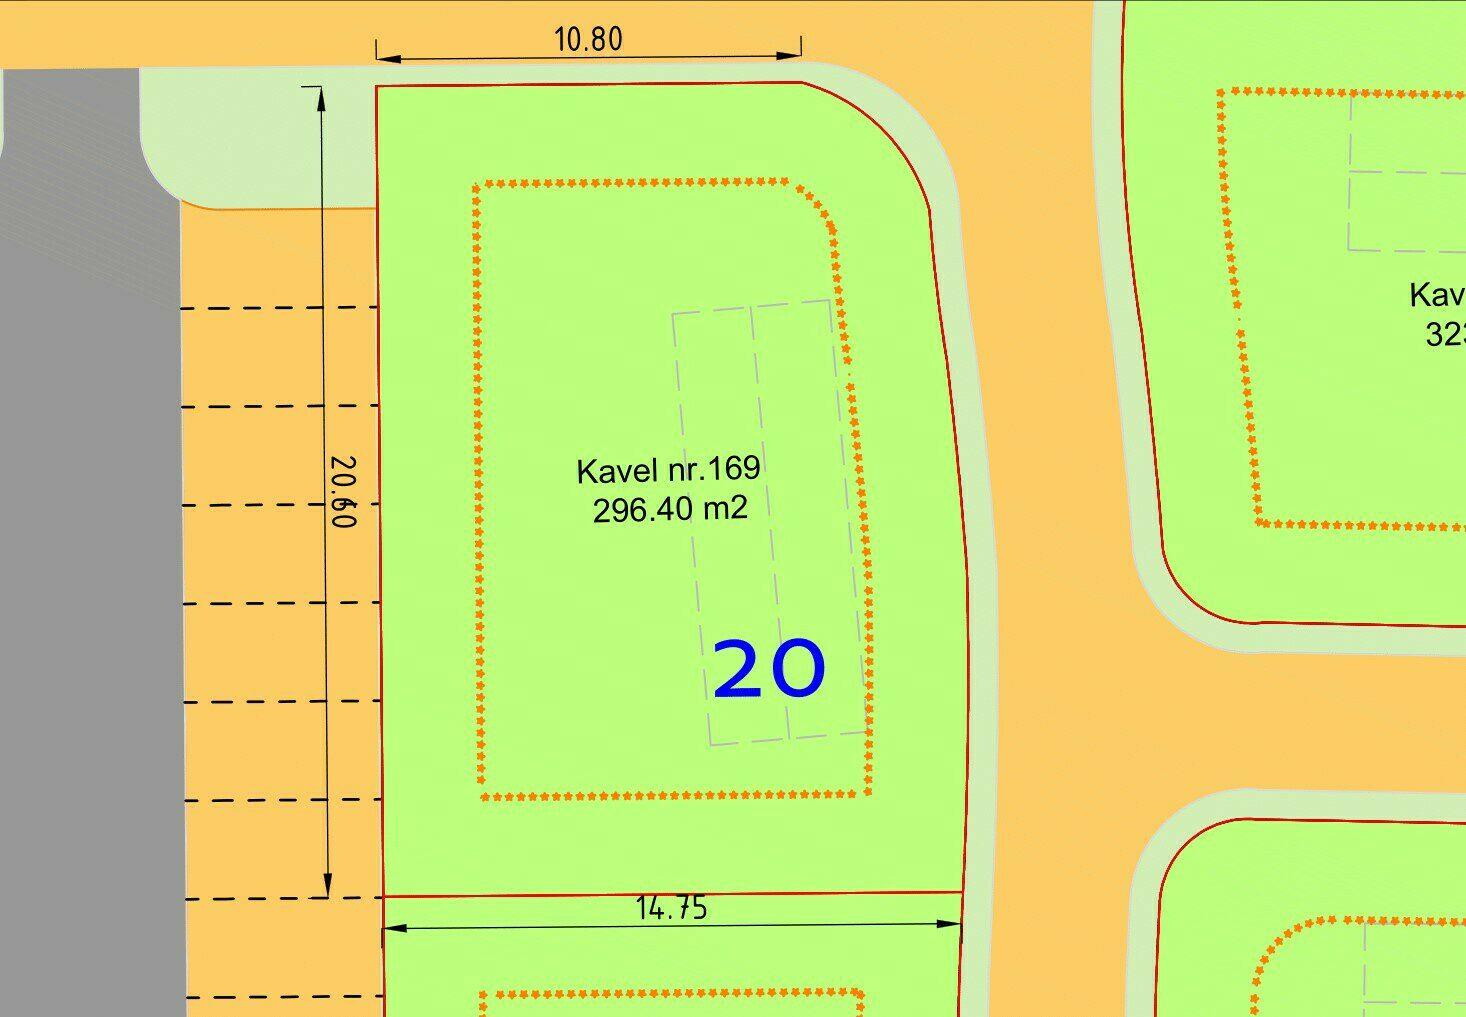 Nachtegaal16 (Grundstück 169)